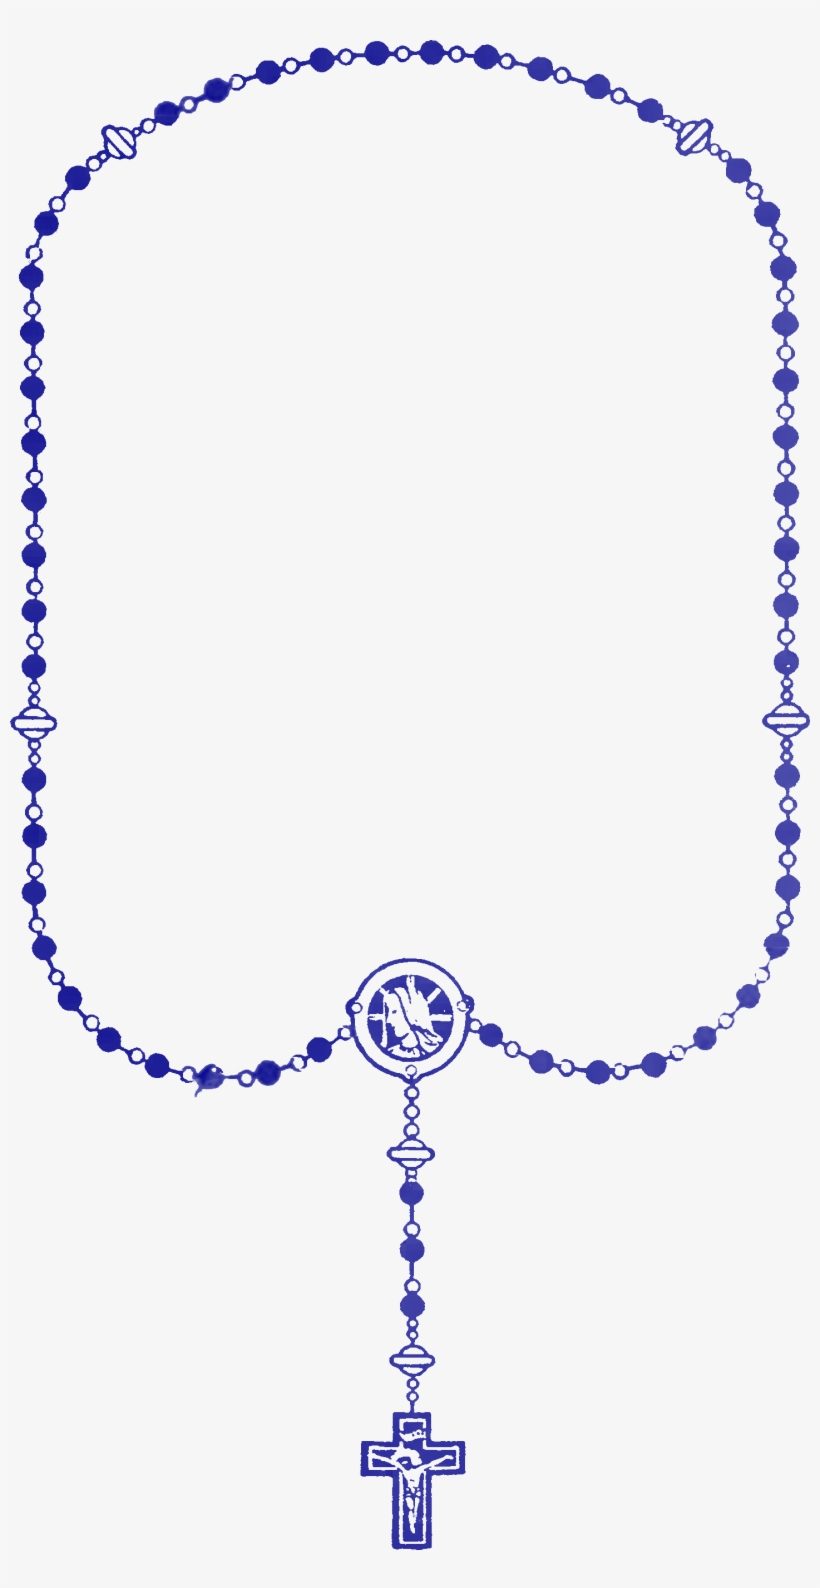 Rosary Beads Stock Illustrations – 841 Rosary Beads Stock Illustrations,  Vectors & Clipart - Dreamstime